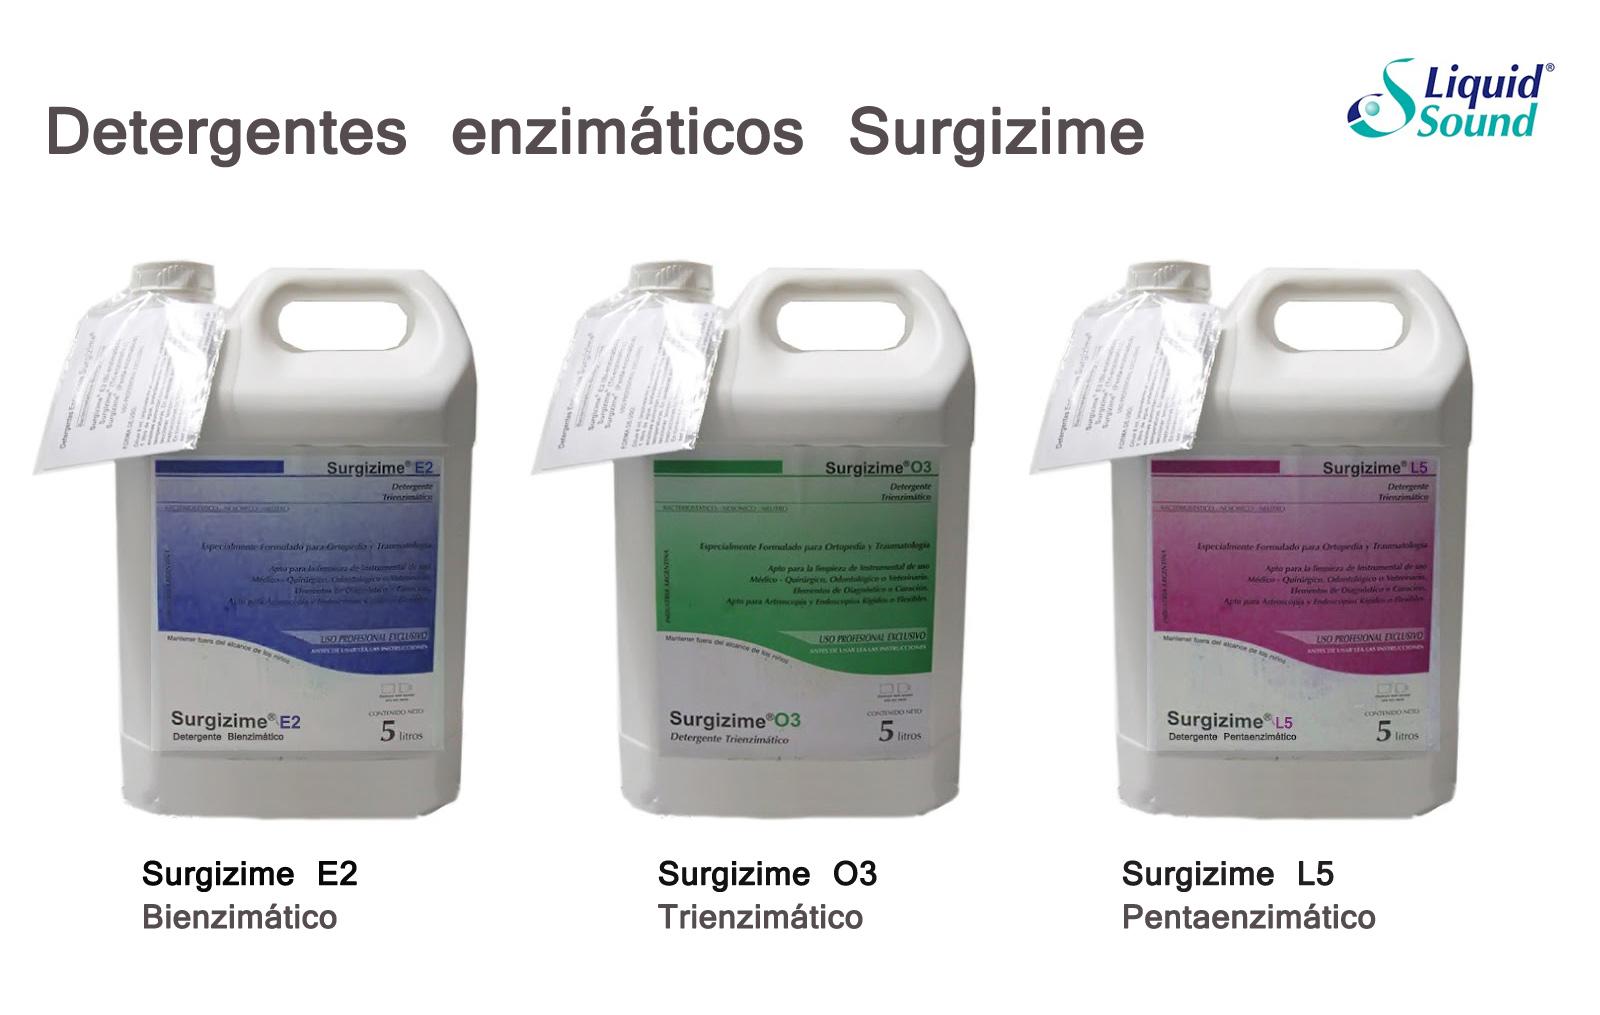 Liquid sound detergentes enzim ticos surgizime for Cual es el mejor detergente para lavadora